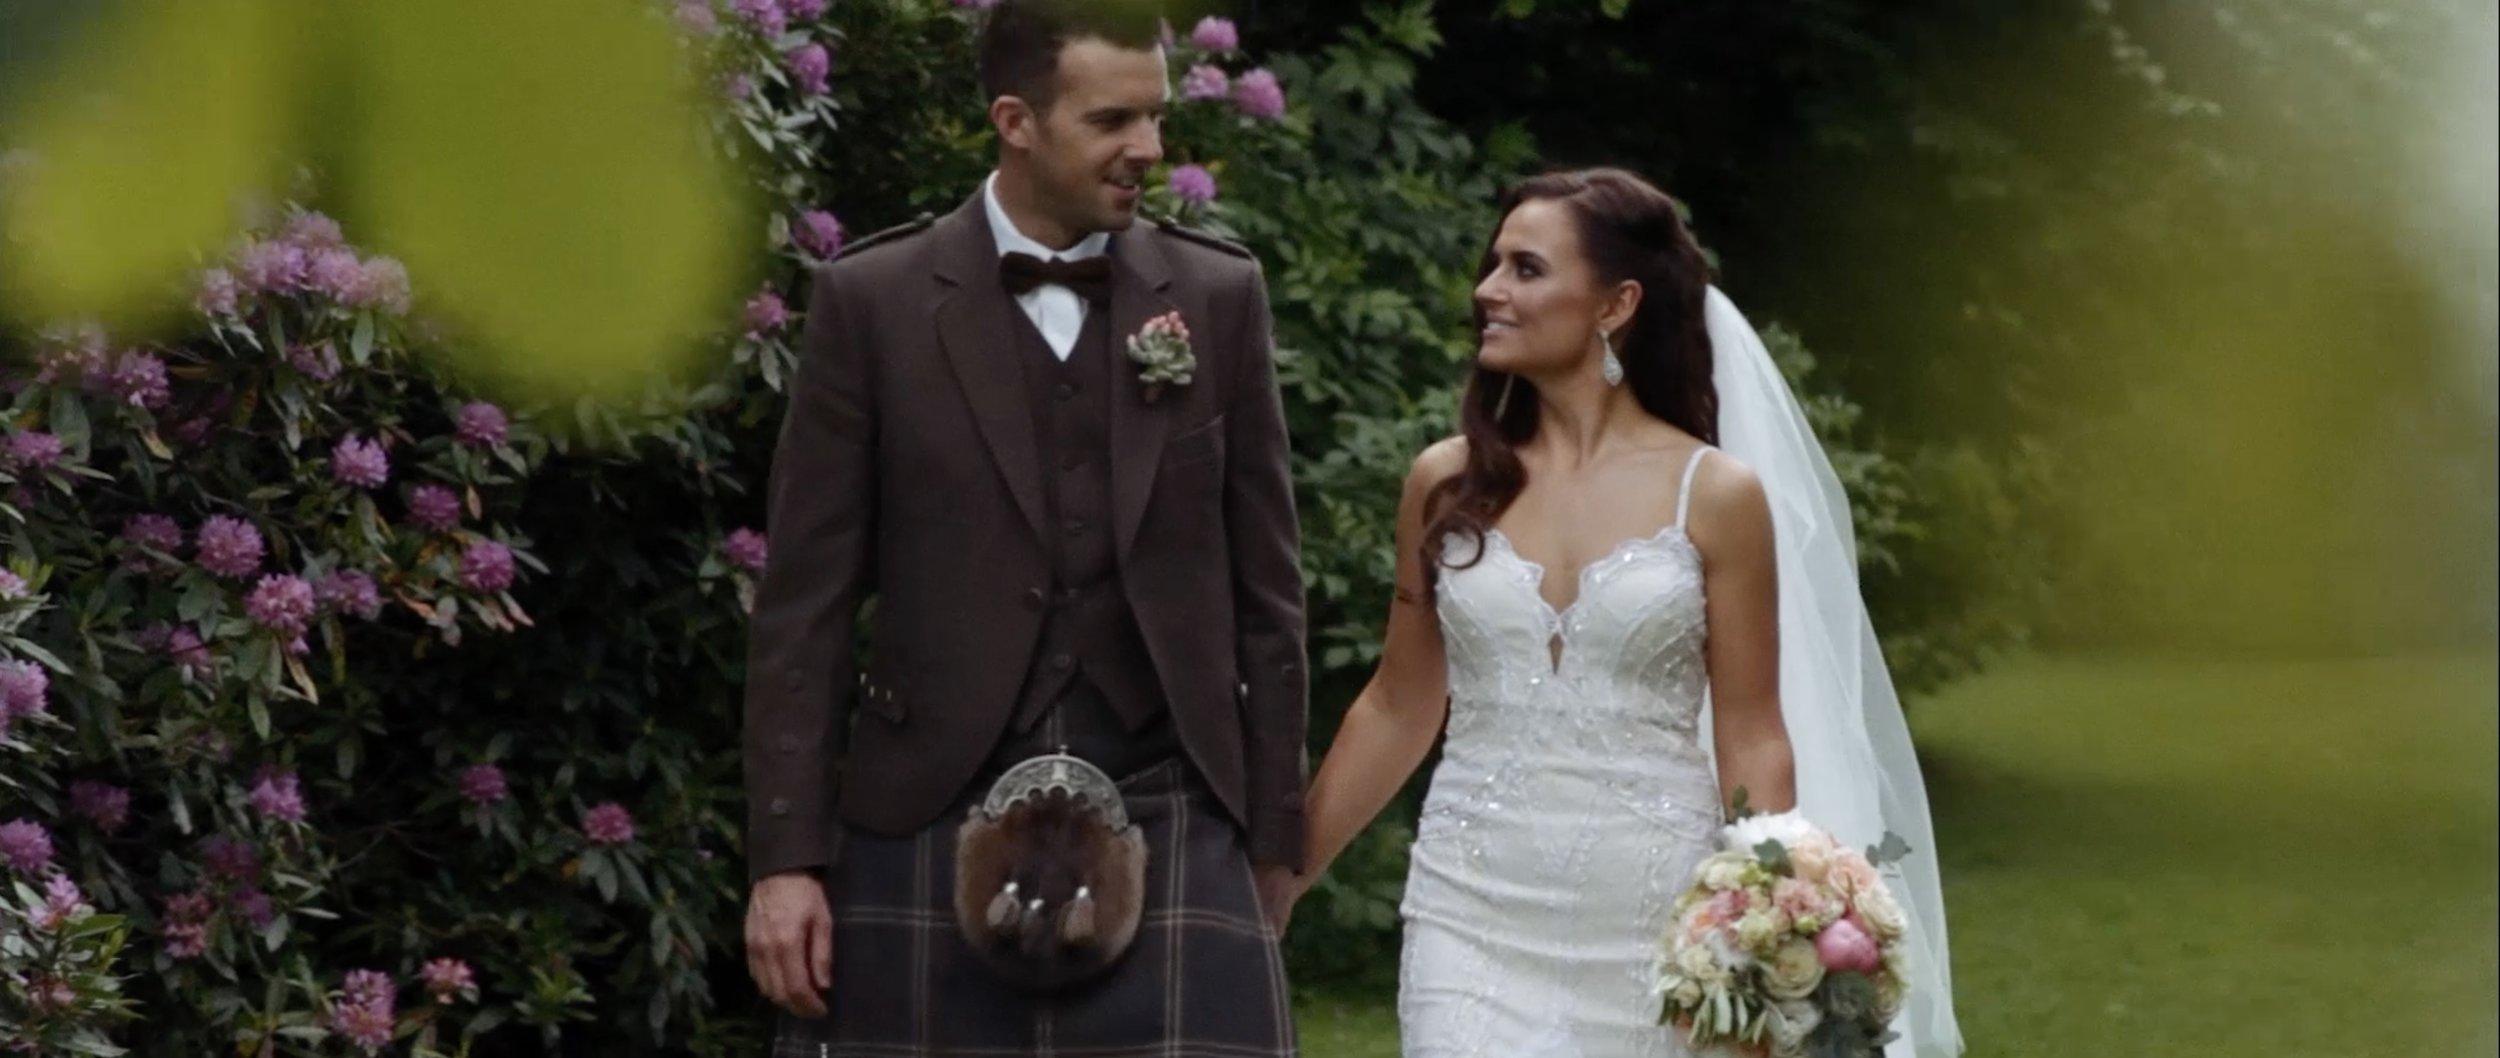 ayr-wedding-videographer_LL_06.jpg